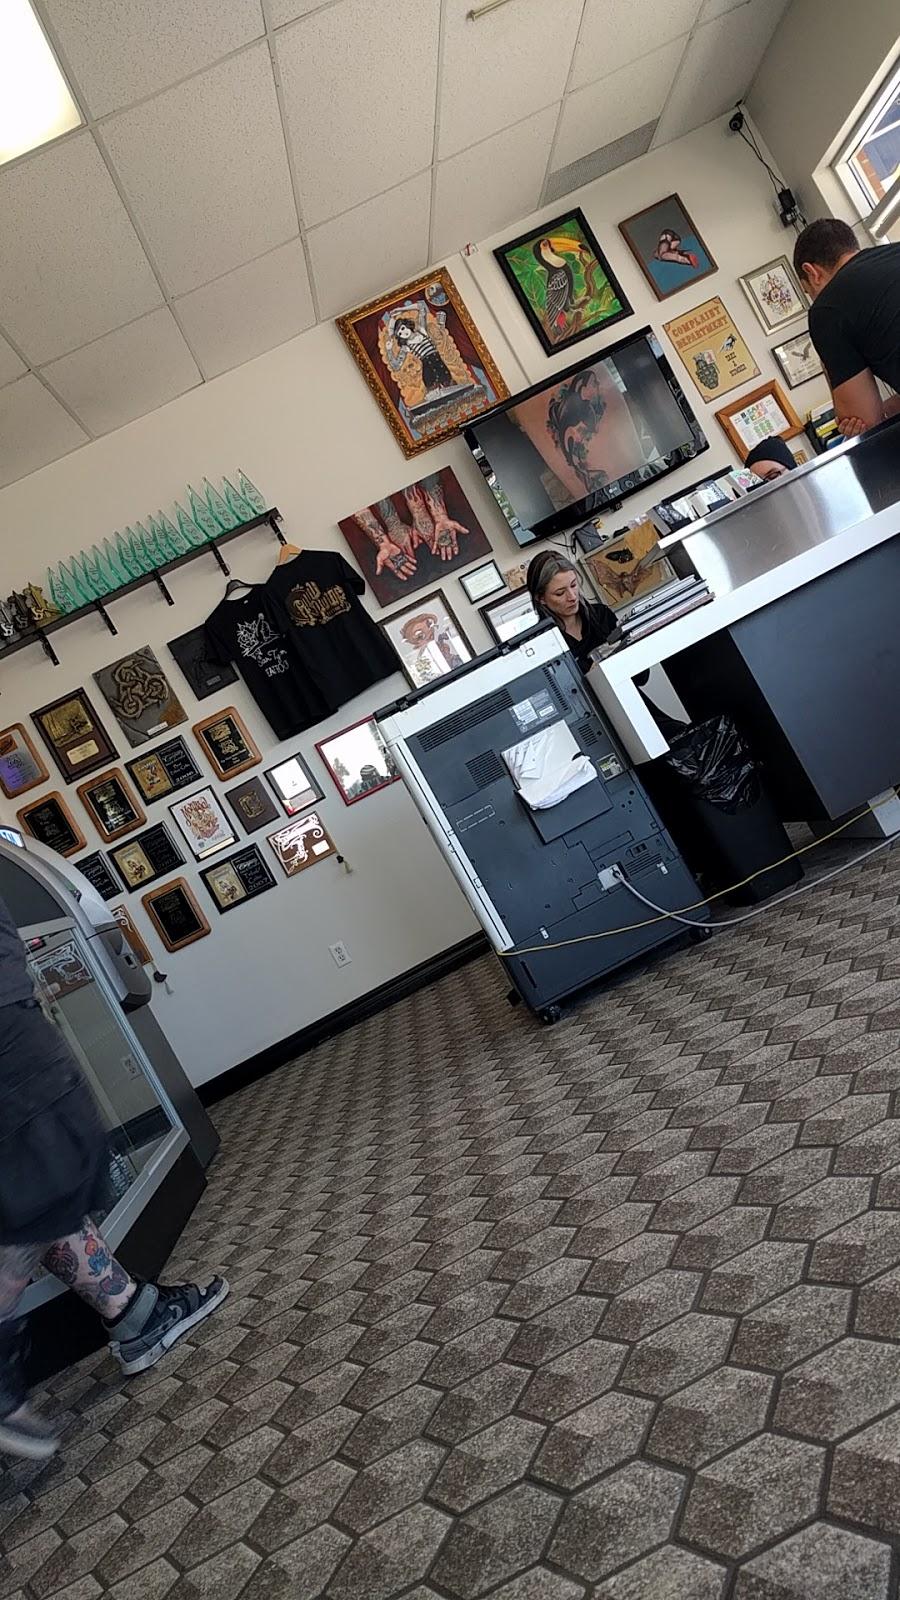 Good Point Tattoos | store | 2335 Trafalgar Rd, Oakville, ON L6H 6N9, Canada | 9052577444 OR +1 905-257-7444